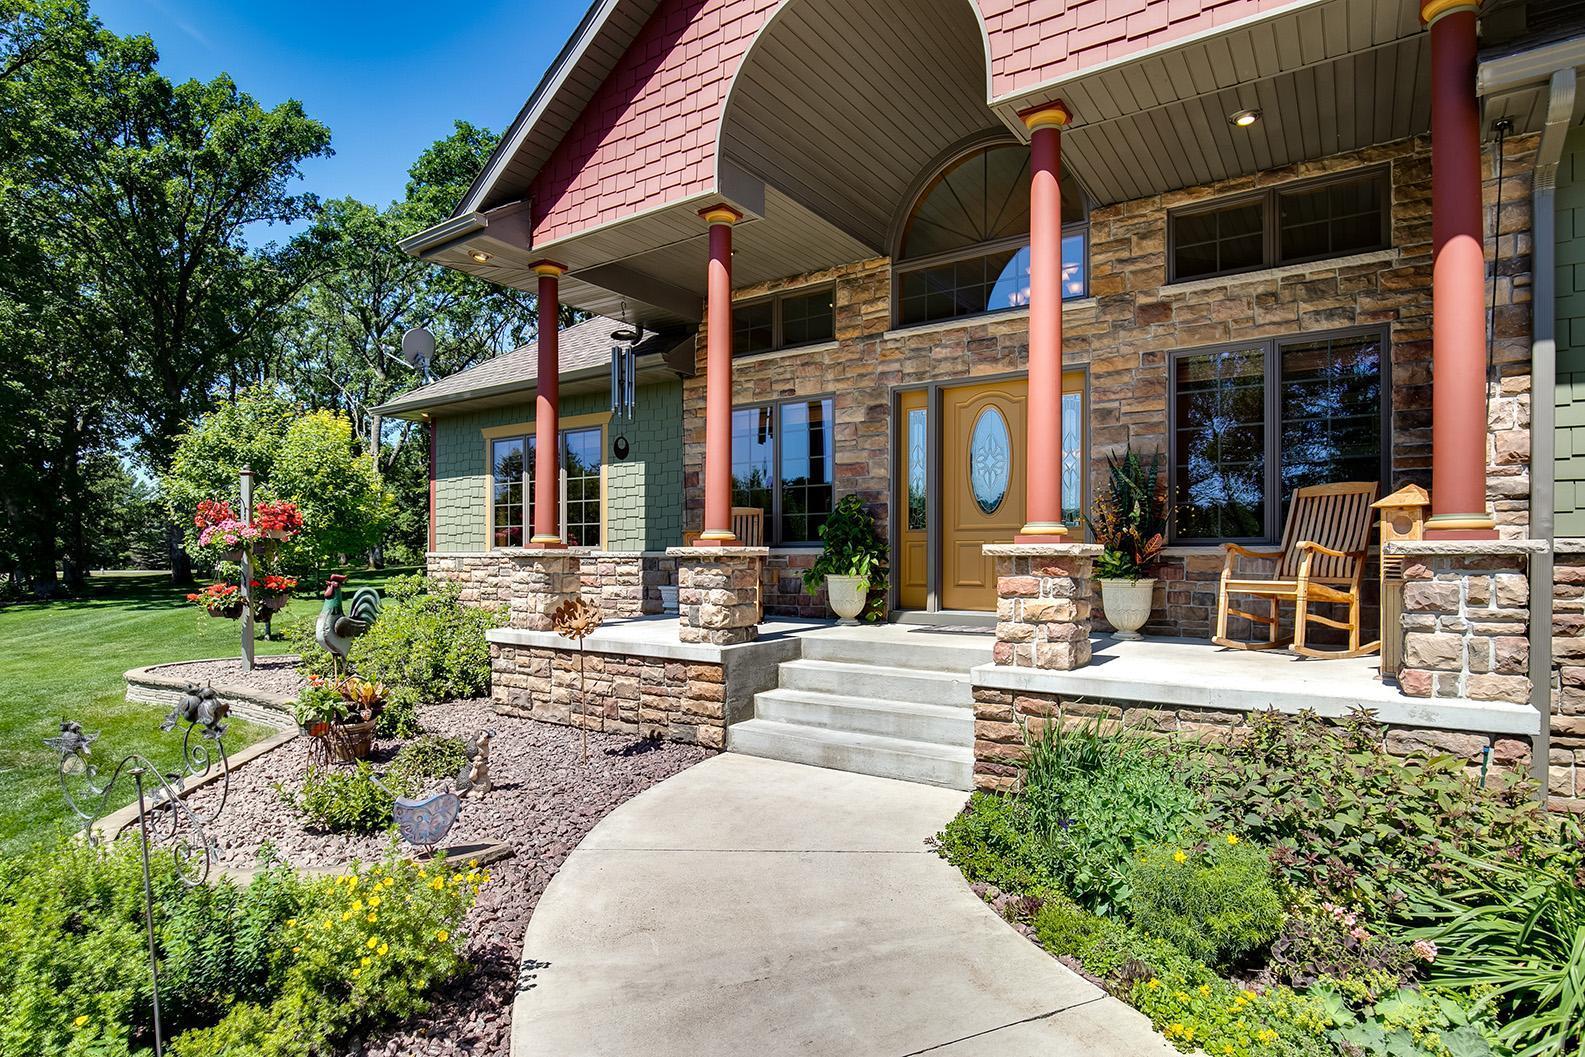 18874 243rd Avenue NW Property Photo - Big Lake, MN real estate listing